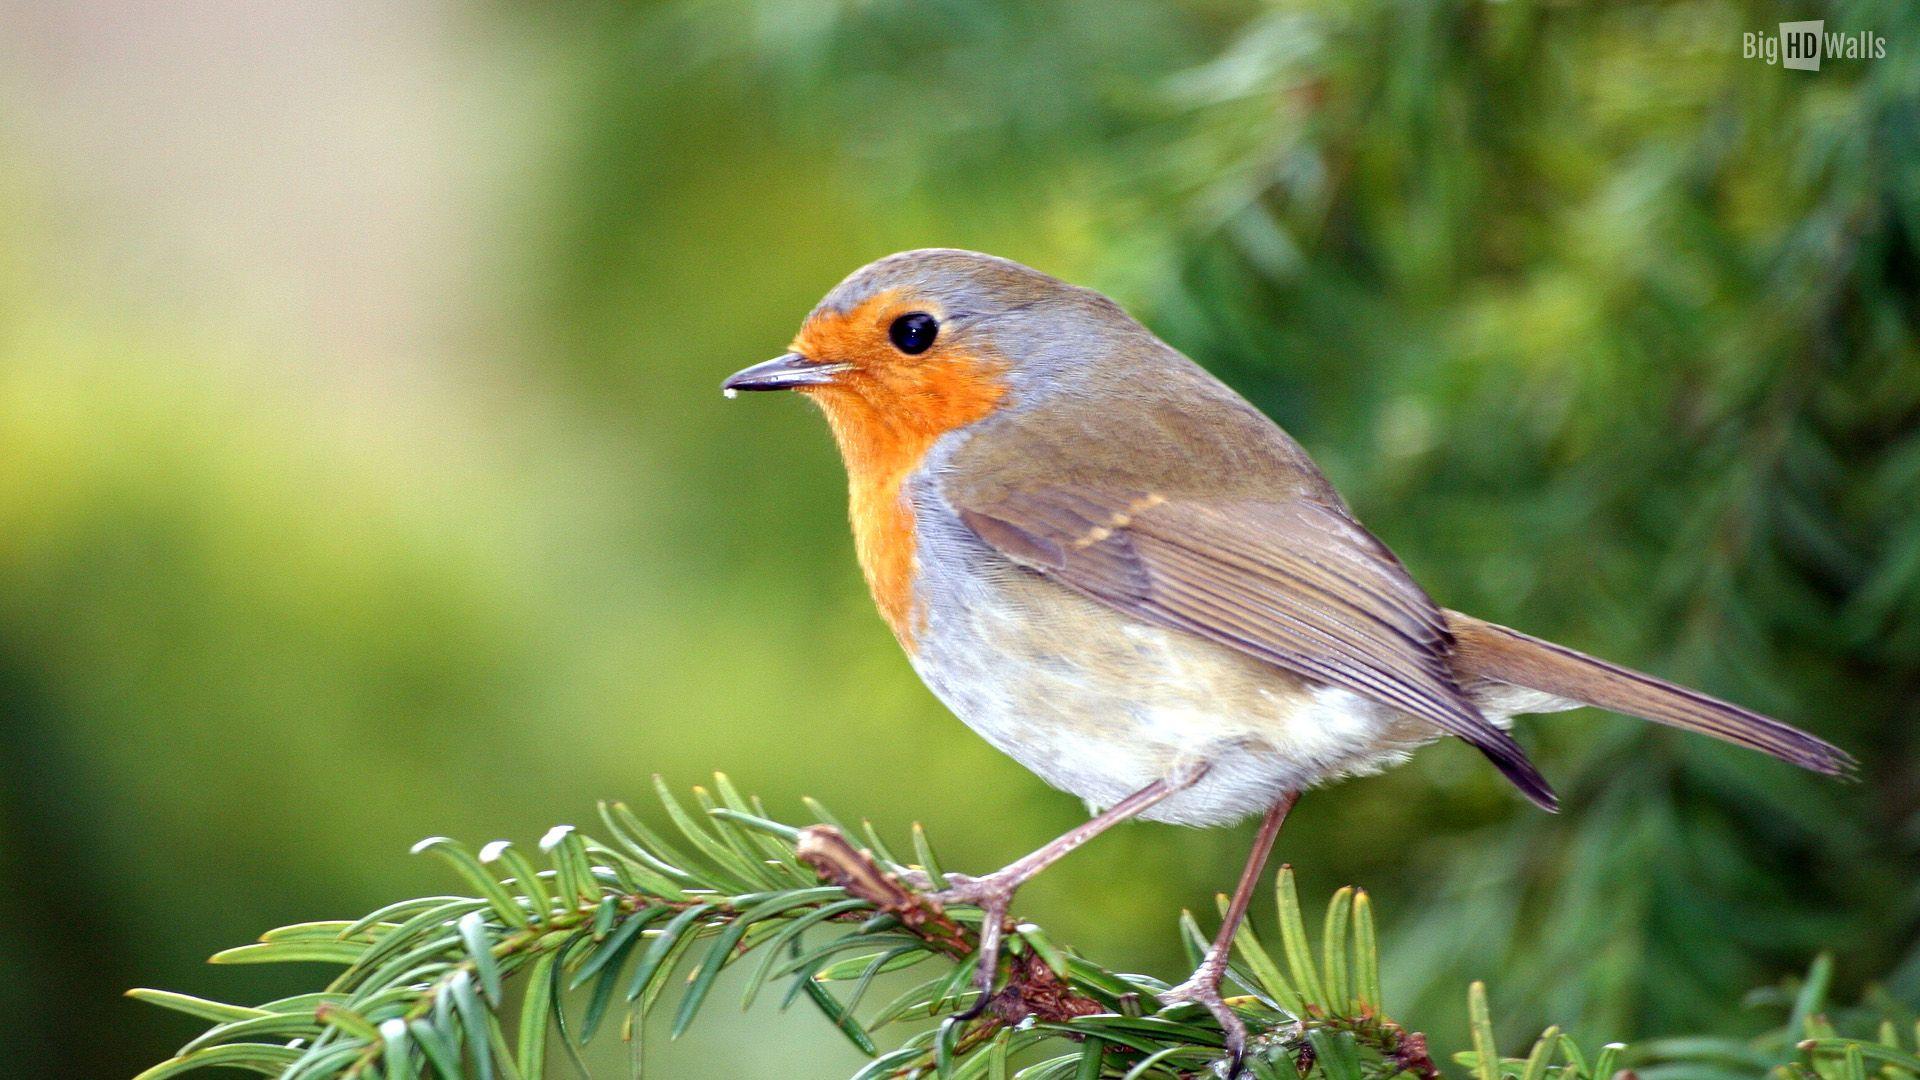 Beautiful Bird Desktop Background Picture Bighdwalls